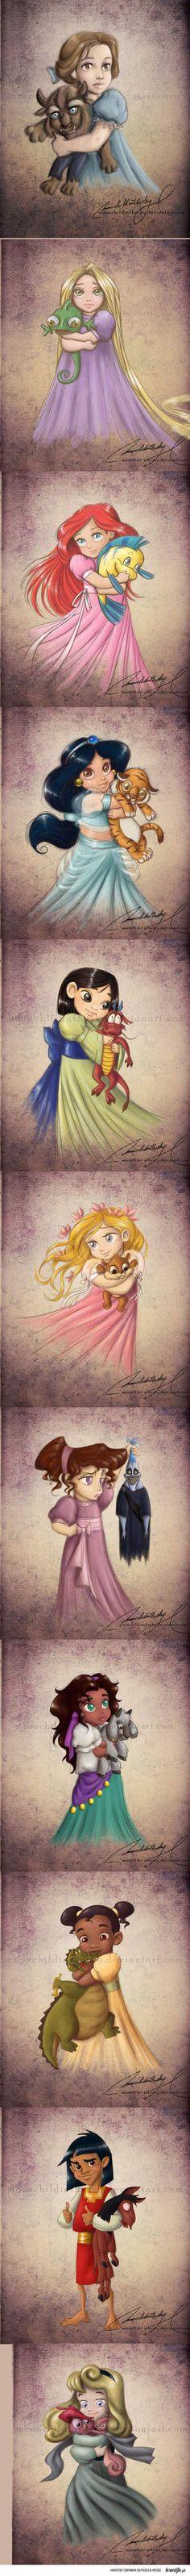 Disney; Belle, Rapunzal, Ariel, Jasmin, Mulan, Aurora, Meg, Esmerelda, Tiana, Kuzco, Cinderella  This is cute, but I find it amusing that all of them are girls cept for one >.>